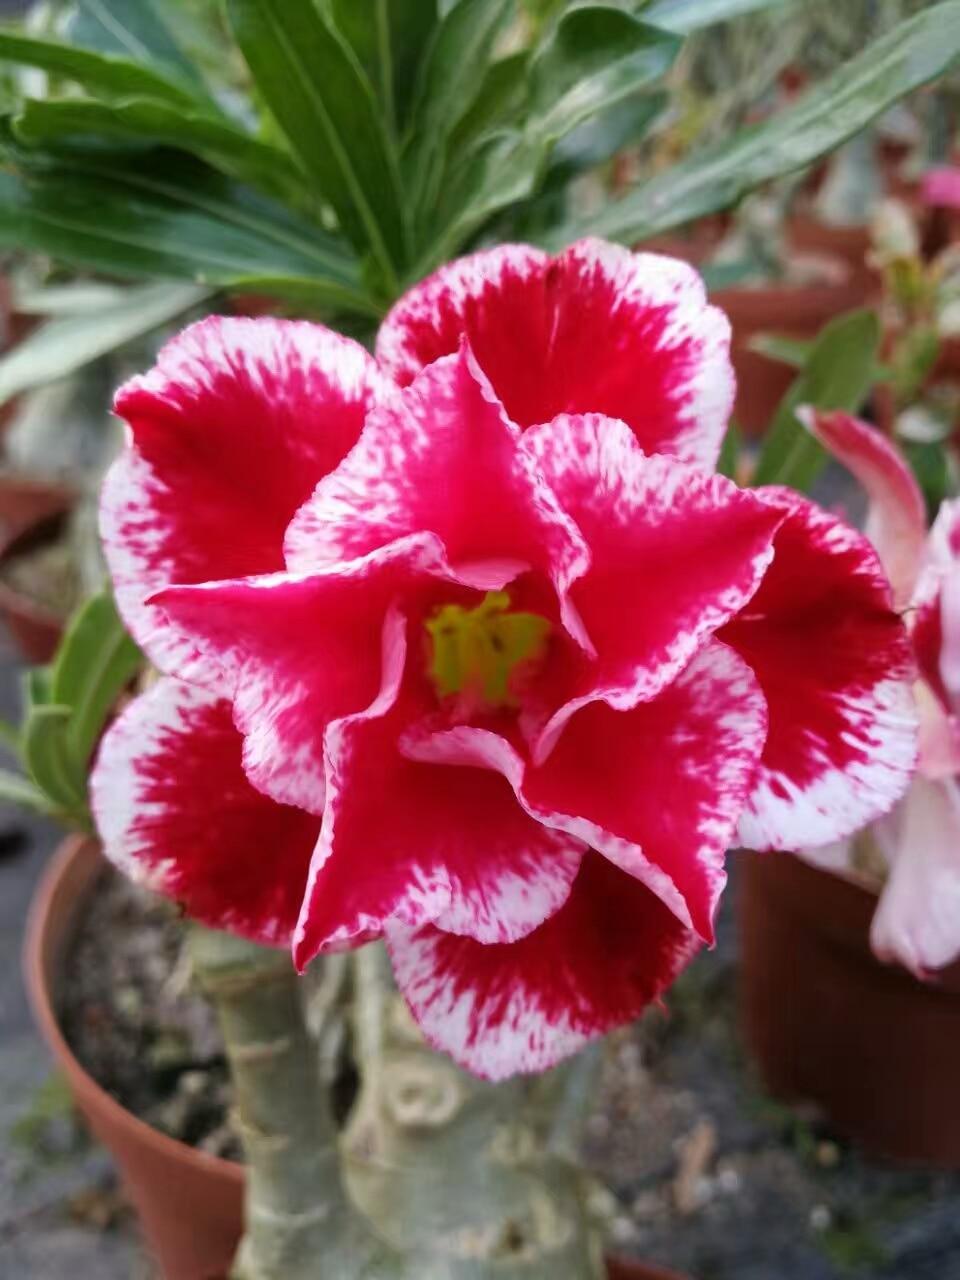 5 SEEDS 100% Genuine Fresh Rare Adenium Obesum Seeds Bonsai Desert Rose Flower Plant Seeds (N ...